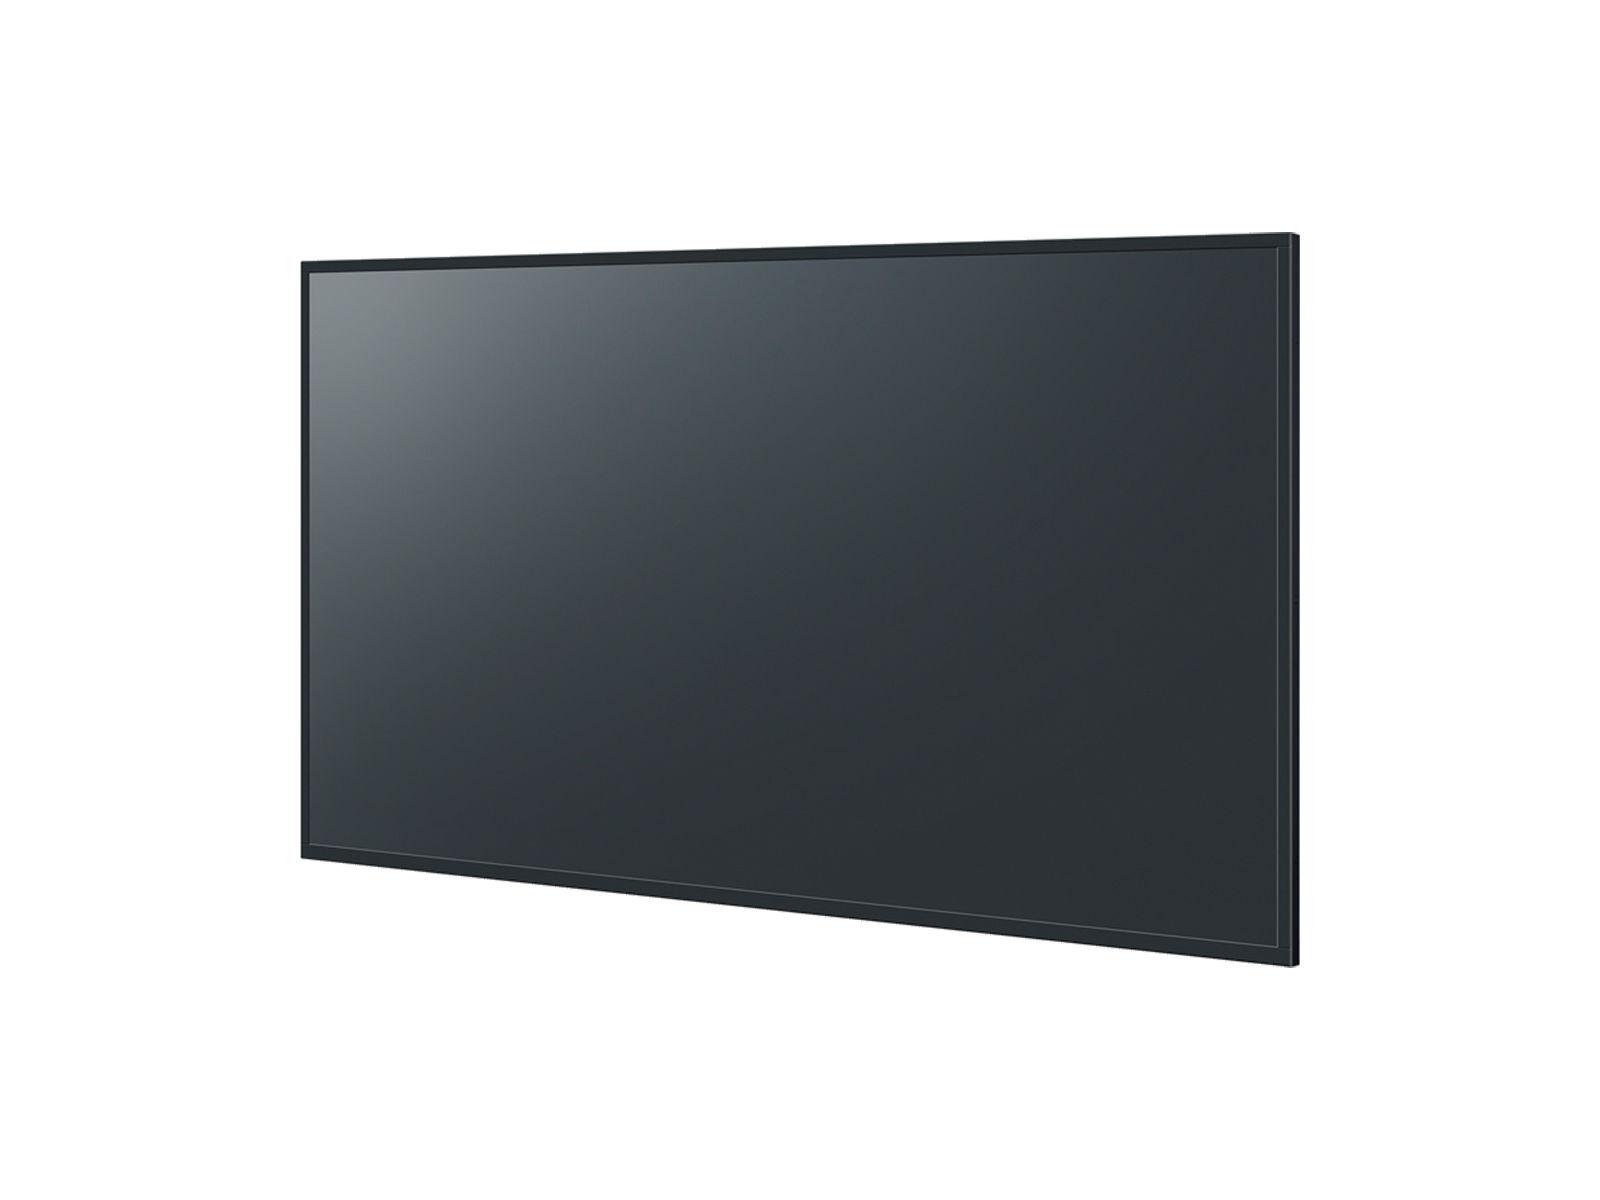 "Panasonic TH-43EQ1 | 108 cm 43"" UHD LCD-Display, LED, 350 cd/m²,, LAN, USB Mediaplayer, Lautsprecher, schwarz"